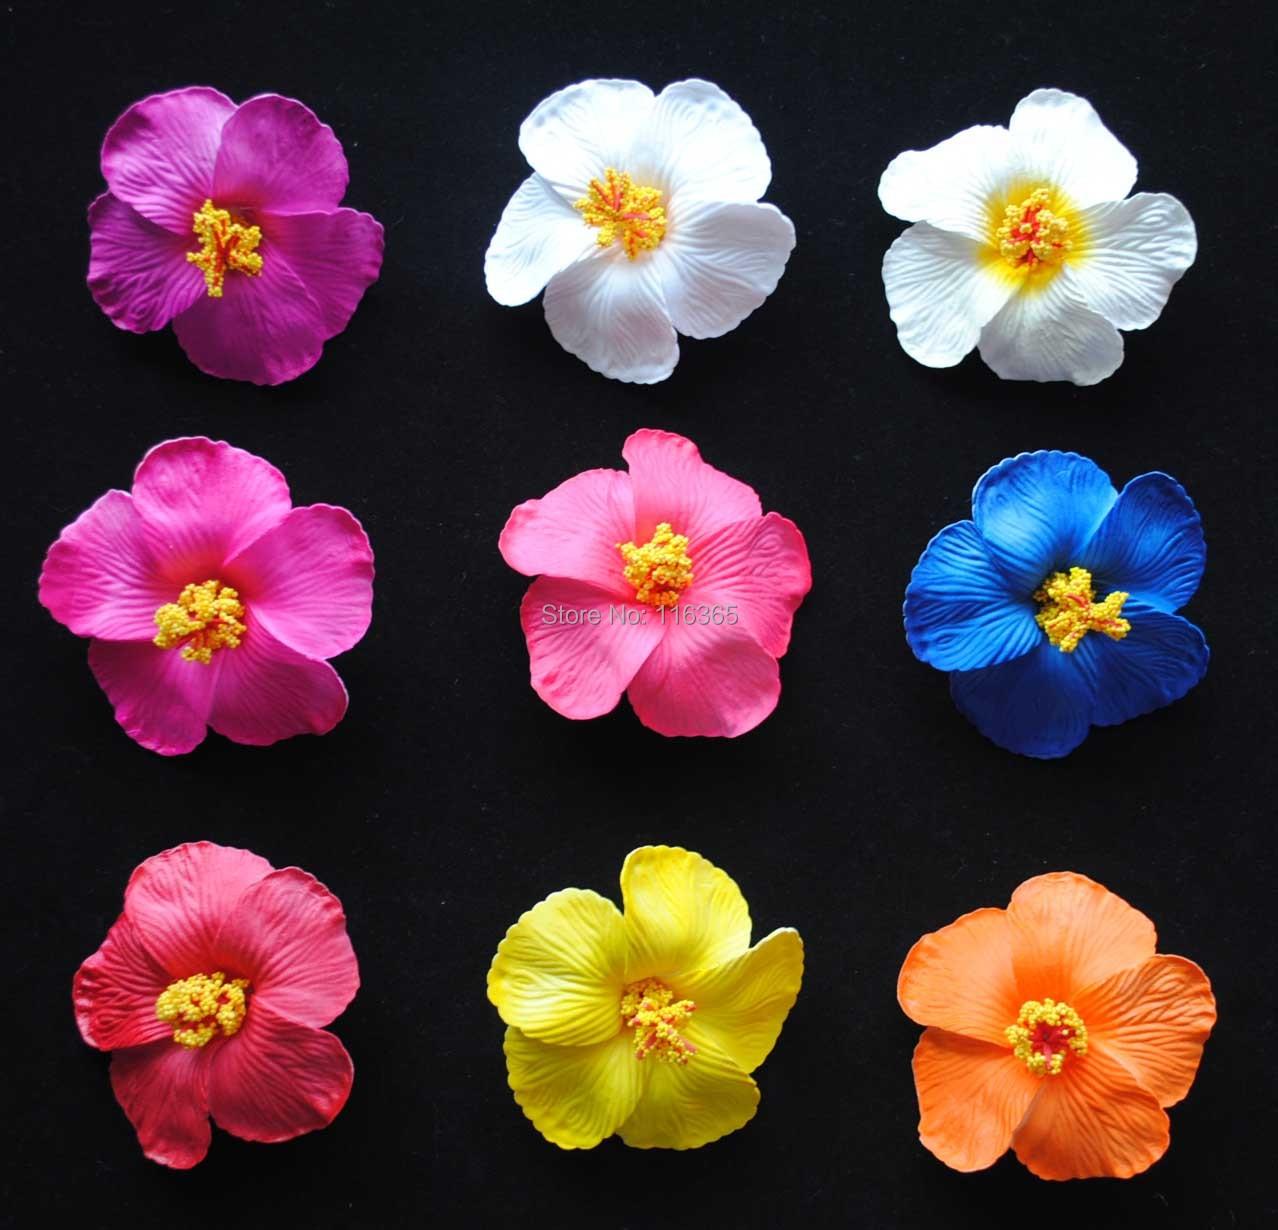 On Sale 40pcs Lot 9cm Hibiscus Foam Flower Hawaiian Hair Flower Clip Decorative Wedding Amp Party